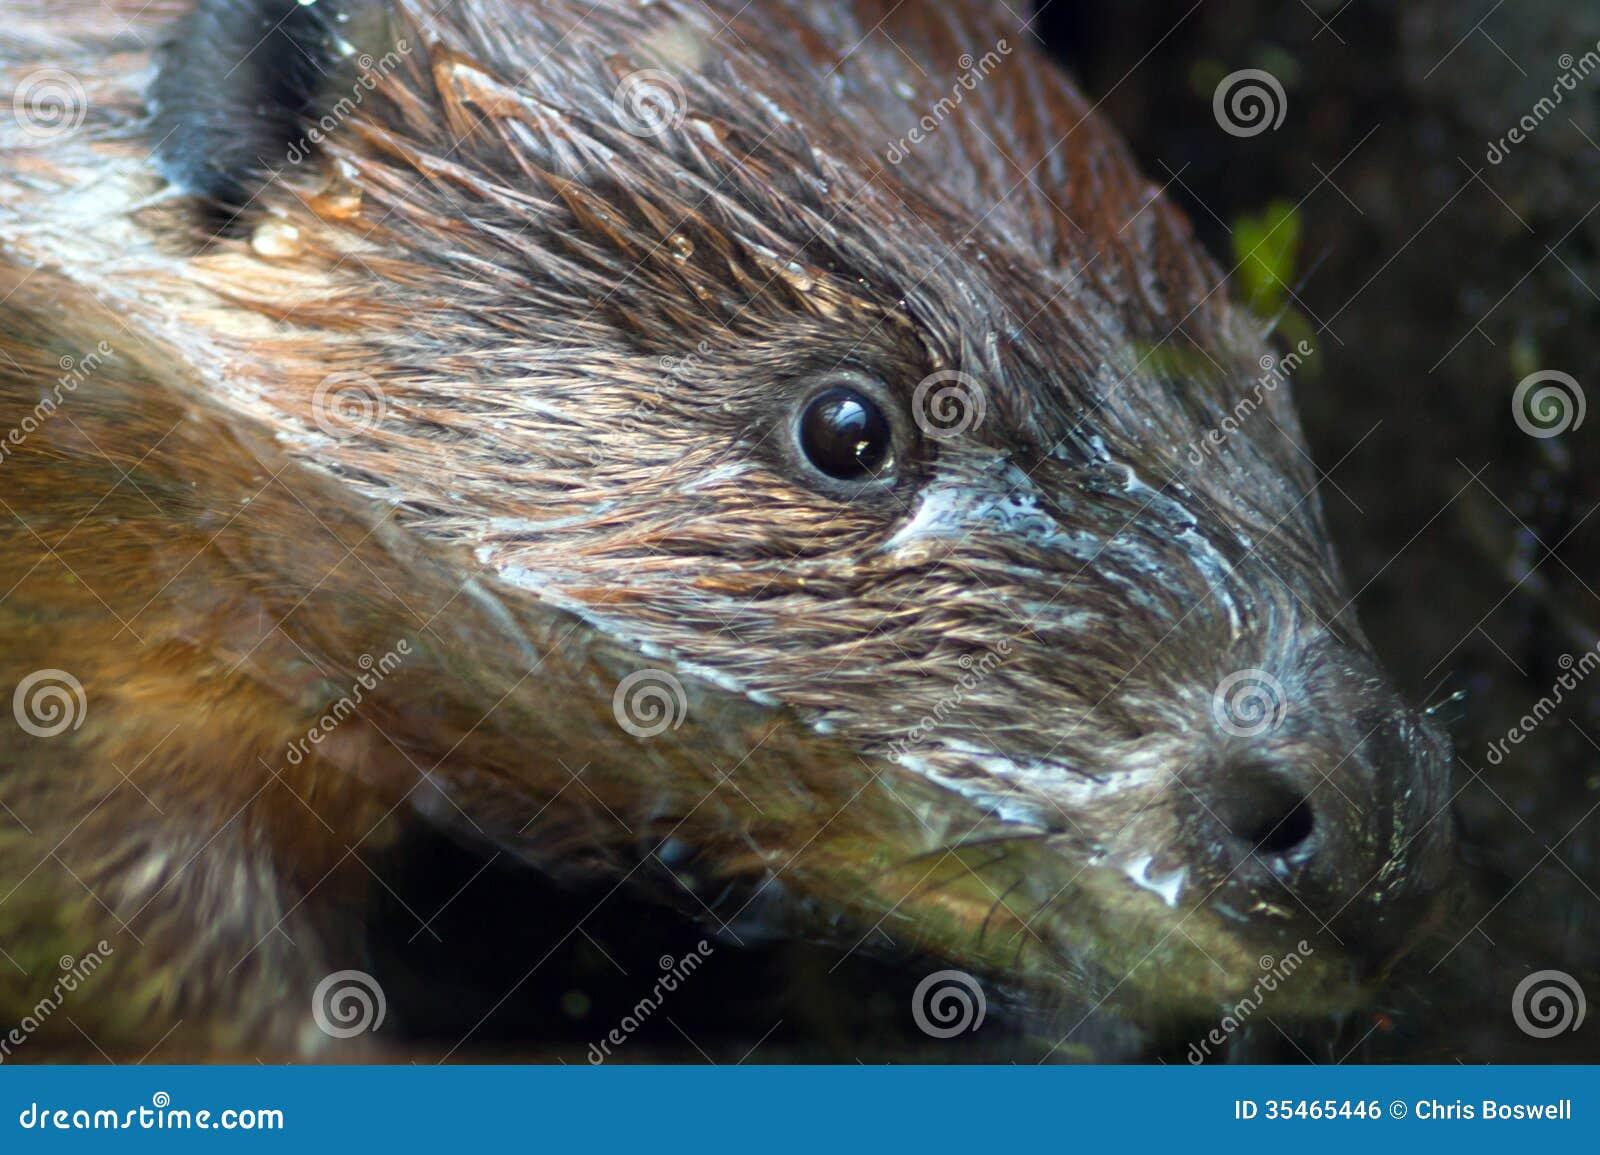 Big Eyed Rodent